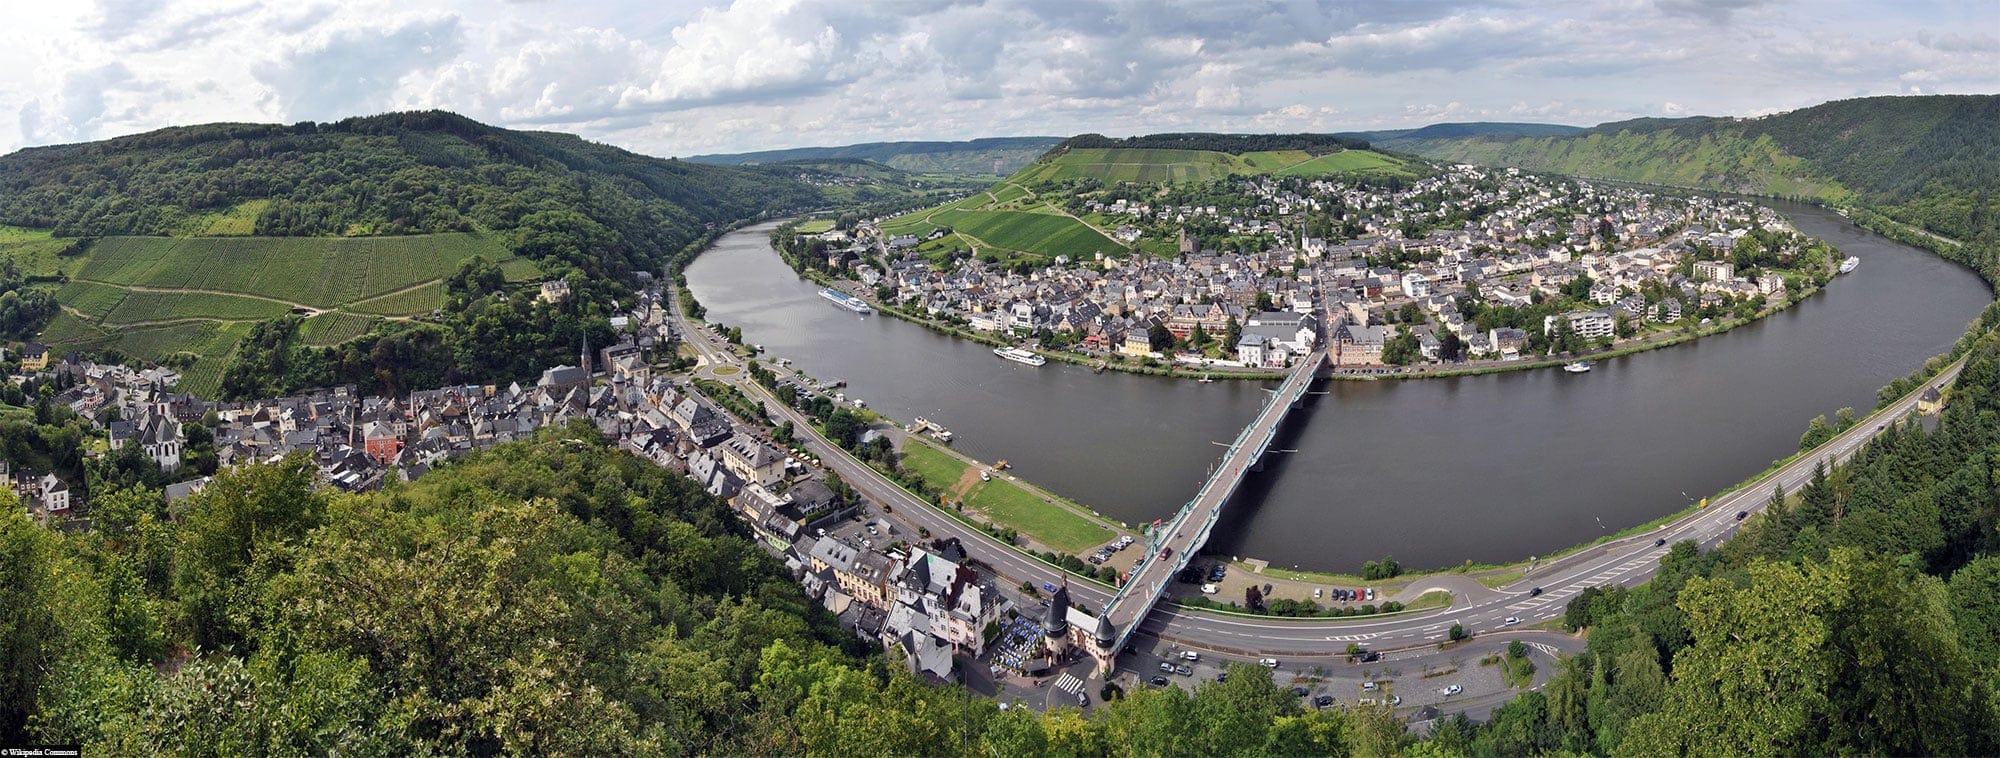 Traben-Trabach, Moselle, Panorama, Germany, Travelreport